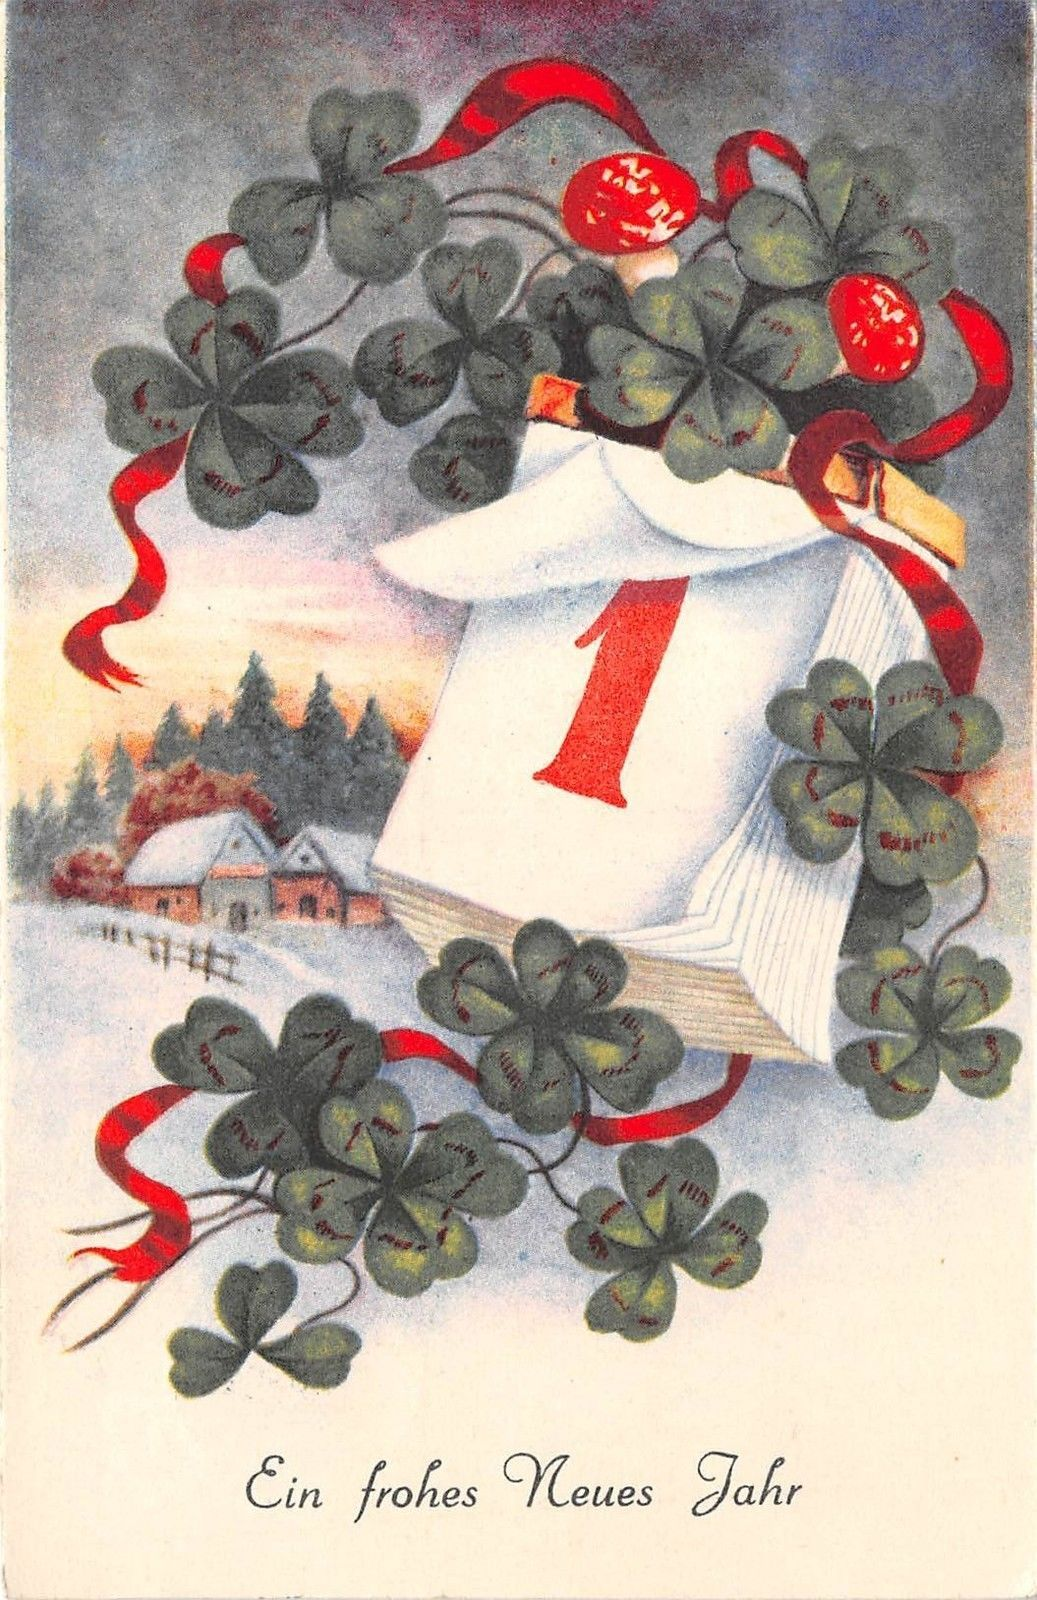 Bg8595 Clover 1 January Mushroom Neujahr New Year Greetings Germany